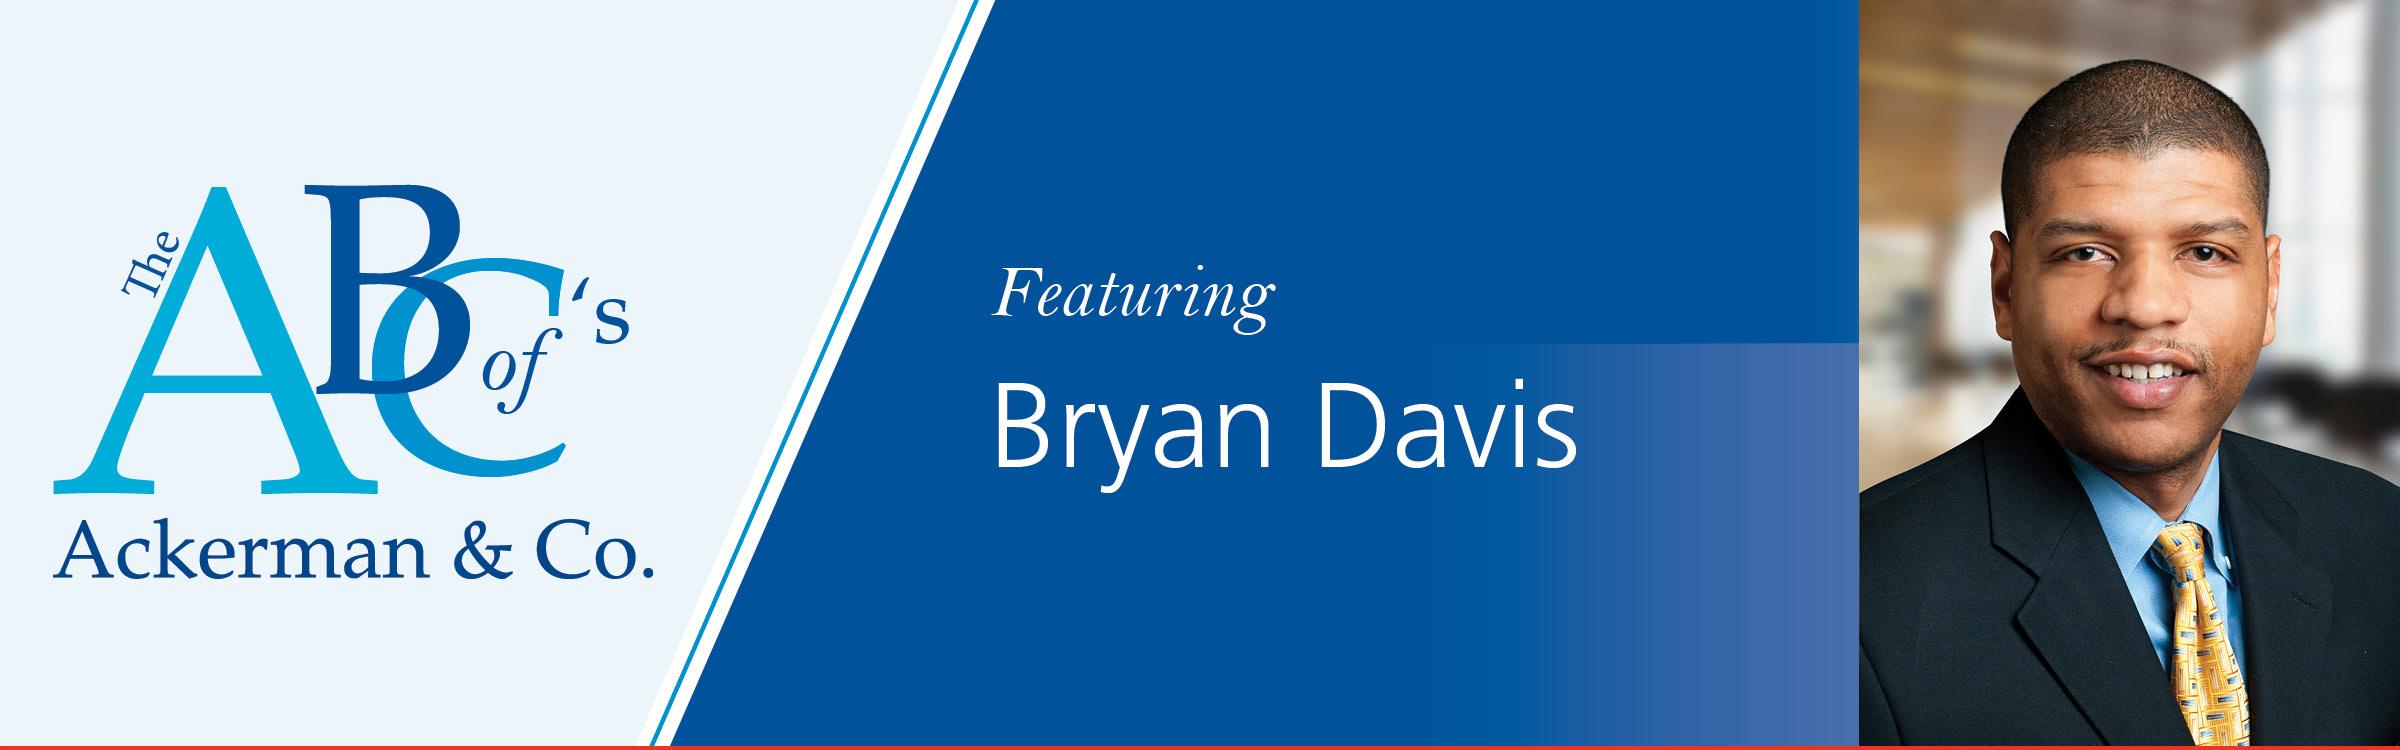 Bryan Davis